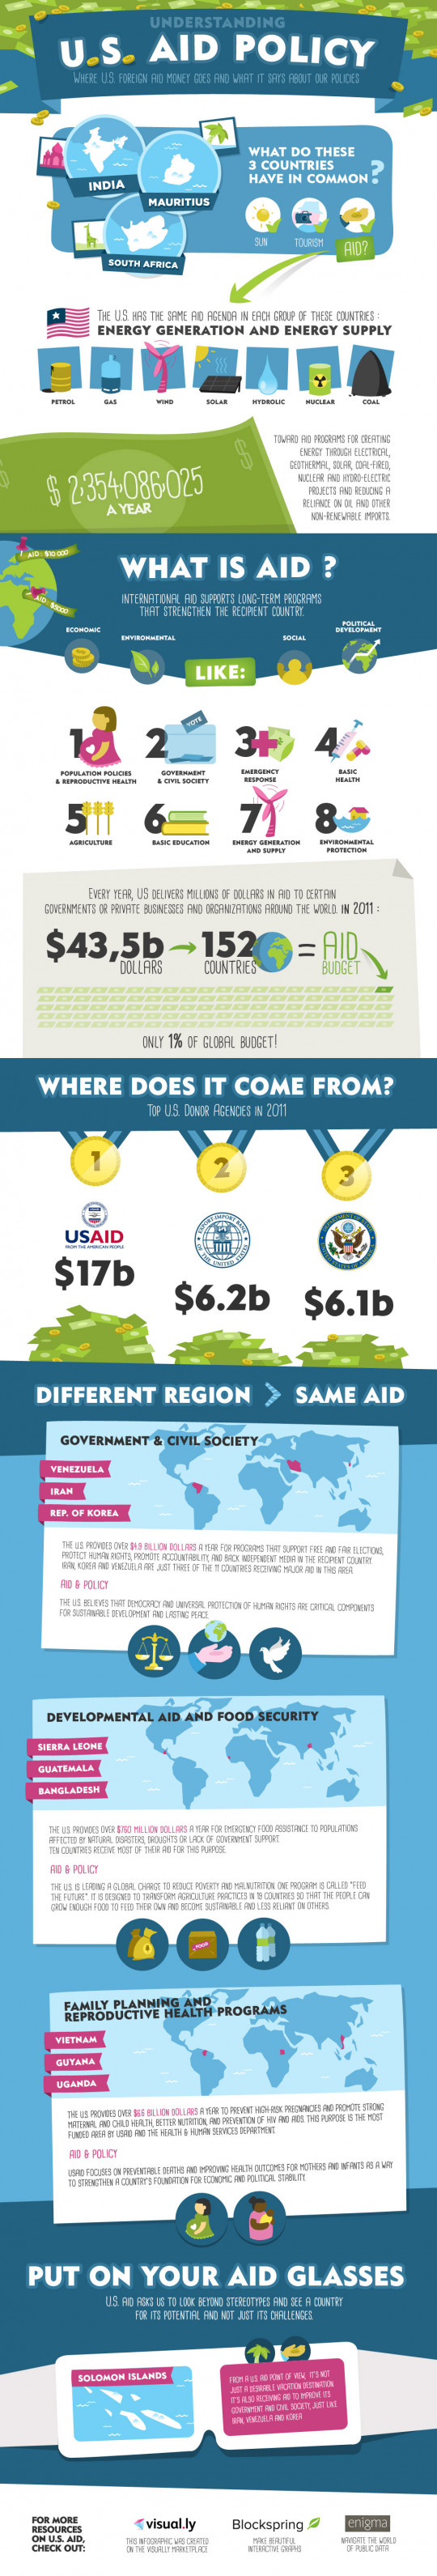 Understanding U.S. Aid Policy